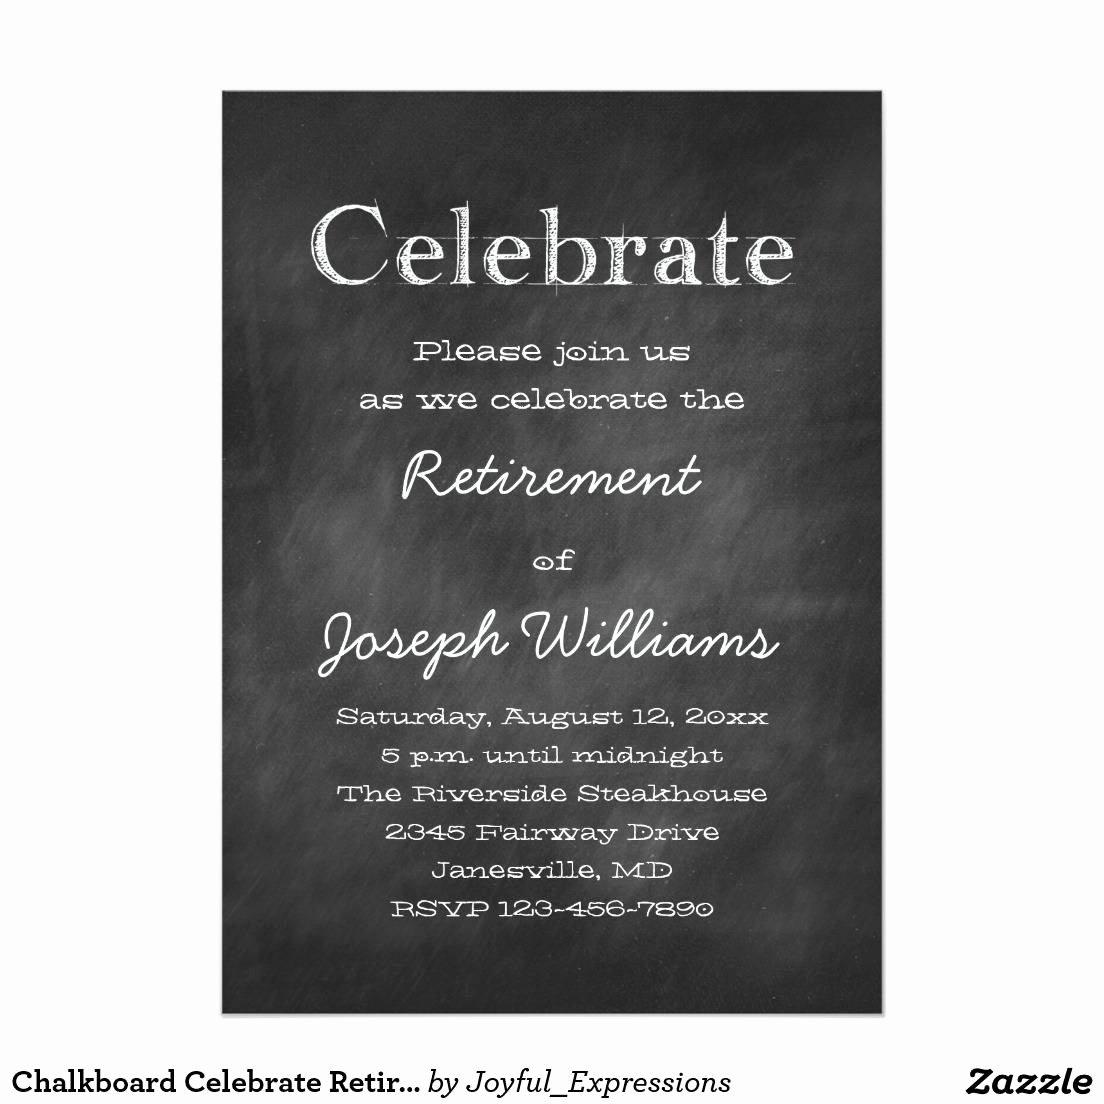 Retirement Invitation Template Free Best Of Retirement Party Invitation Template